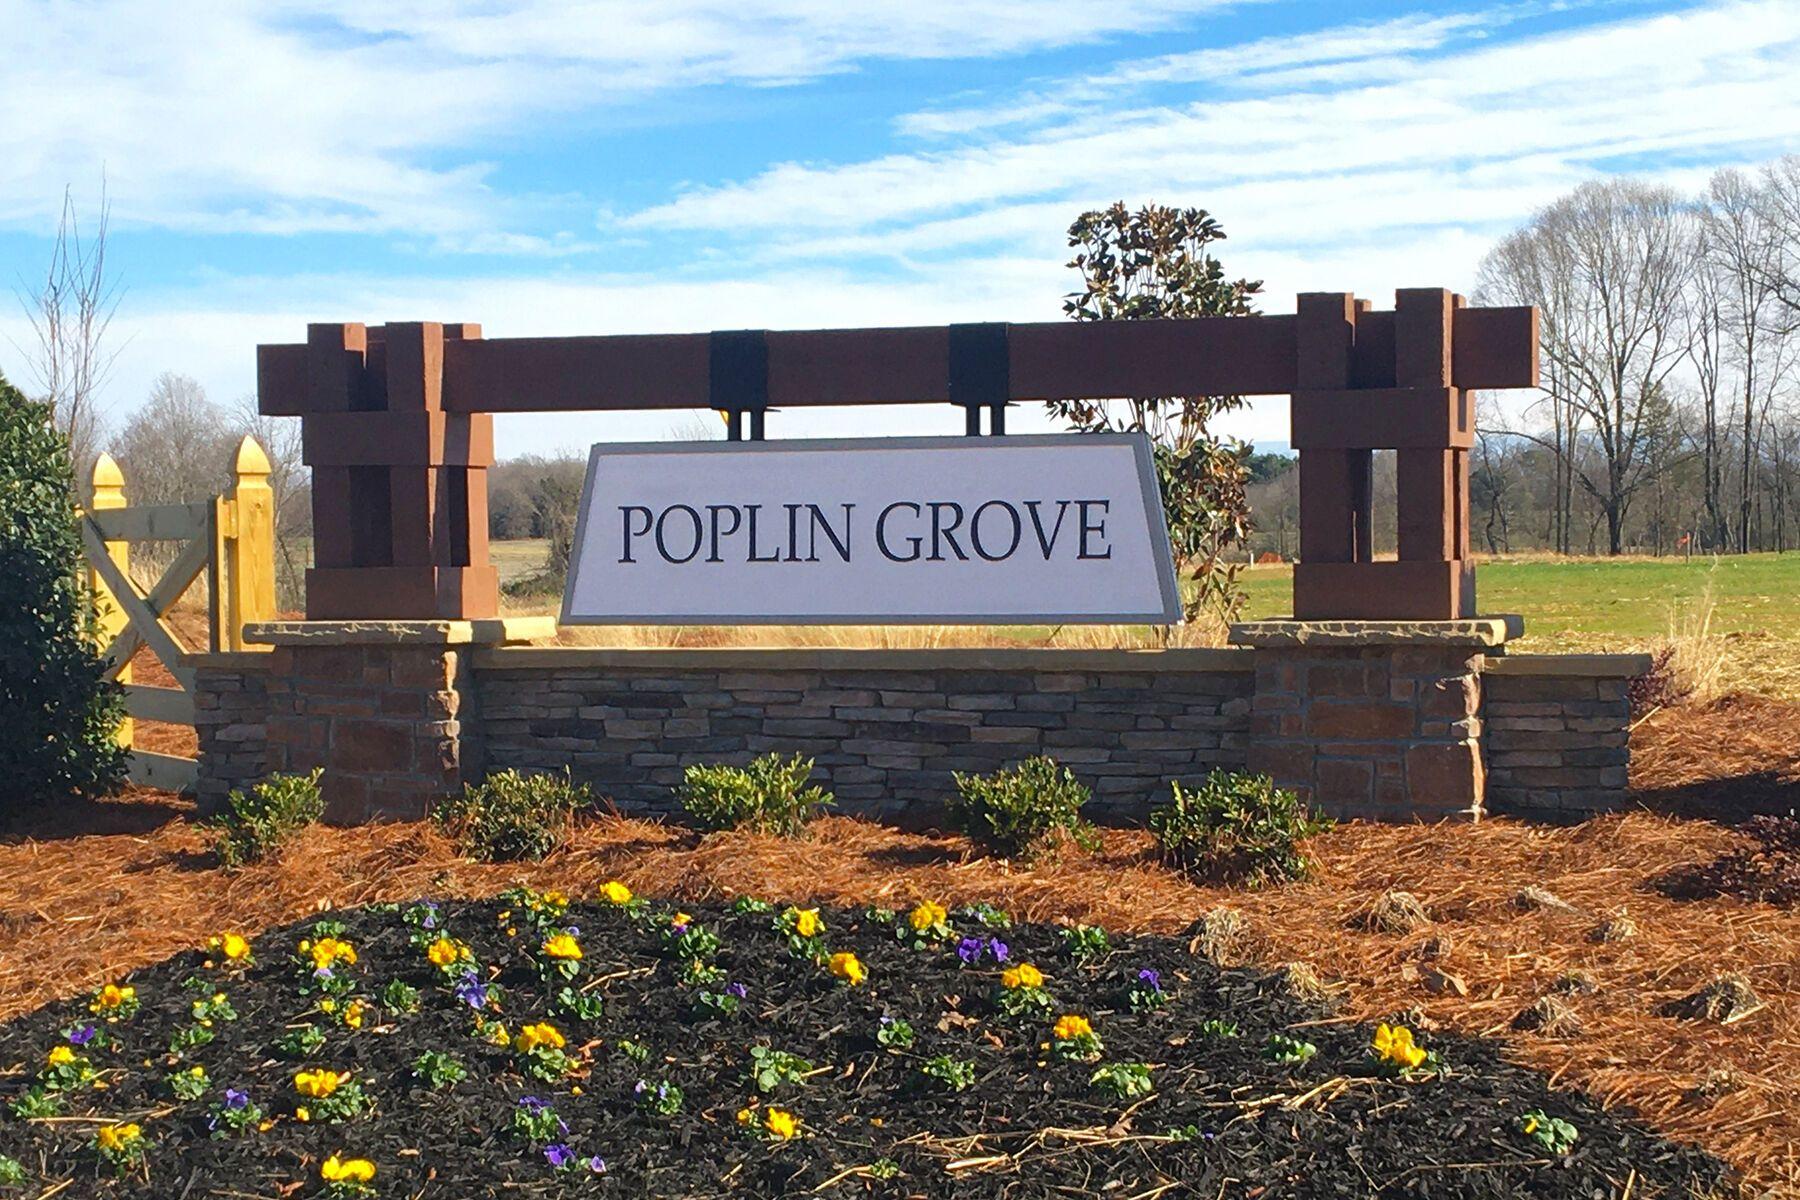 'Poplin Grove' by M/I Homes-Charlotte in Charlotte